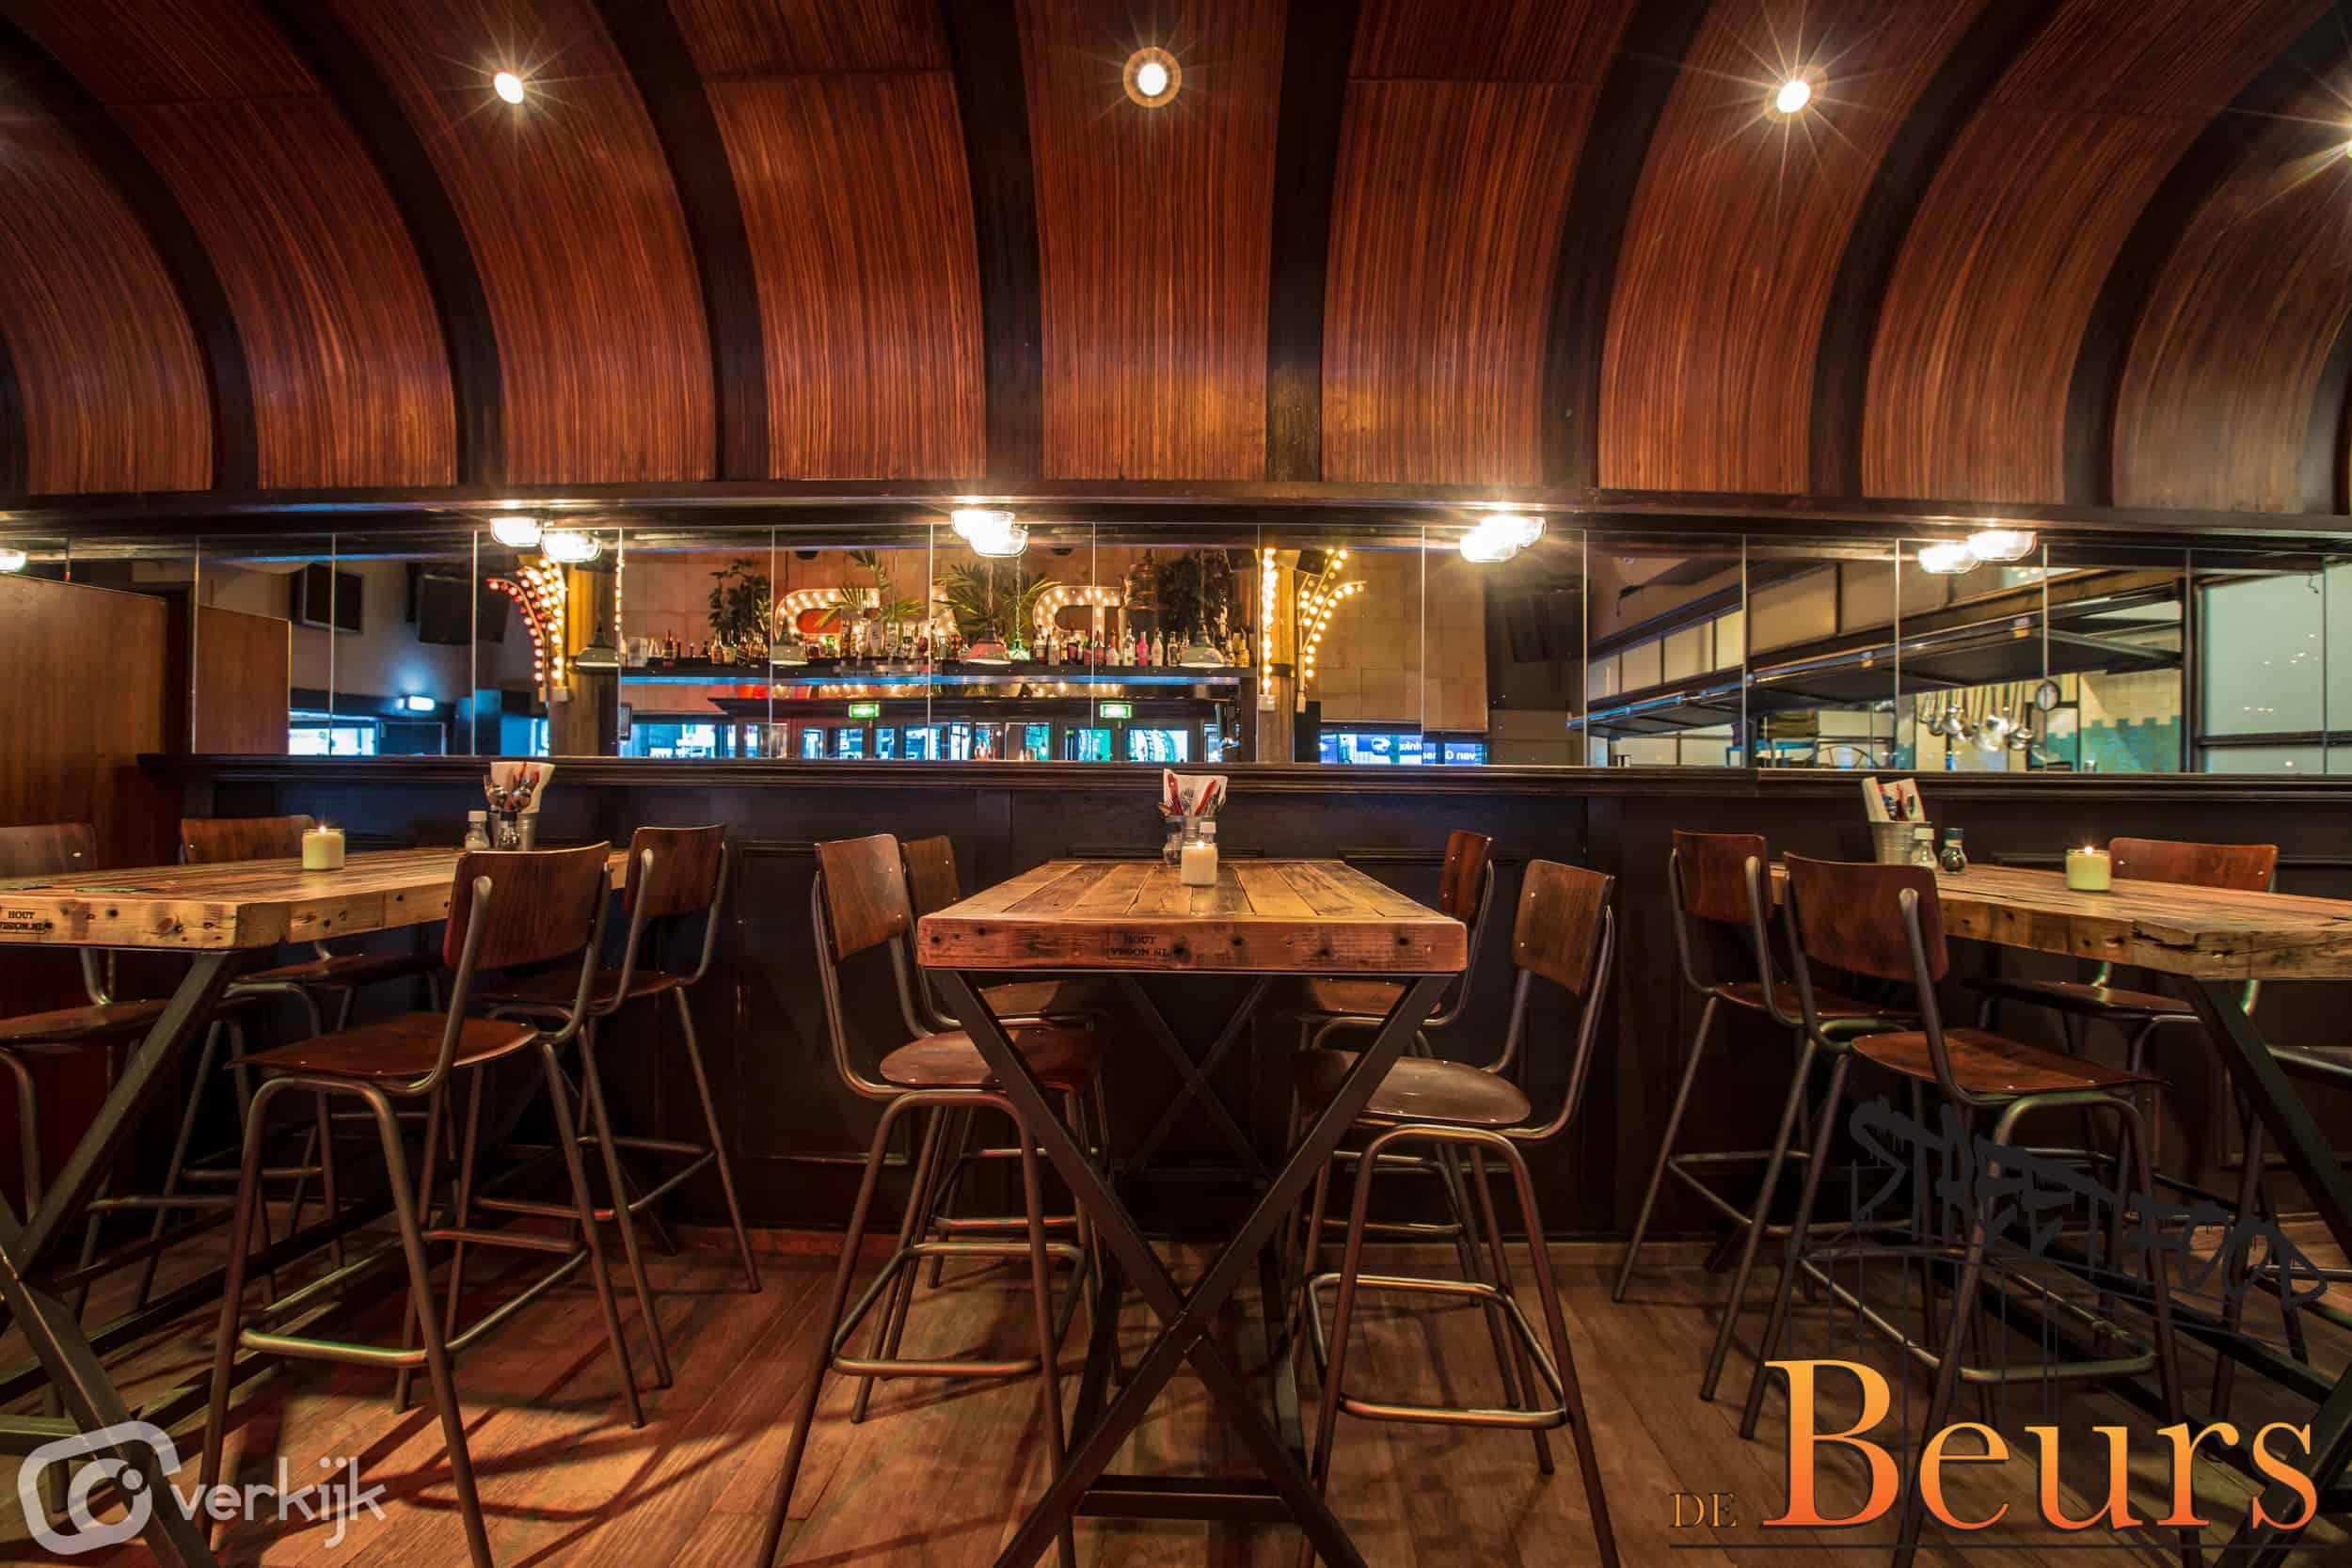 Bartafel - Statafel Oude Haven Douwe Egberts Balken cafe Beurs Rotterdam